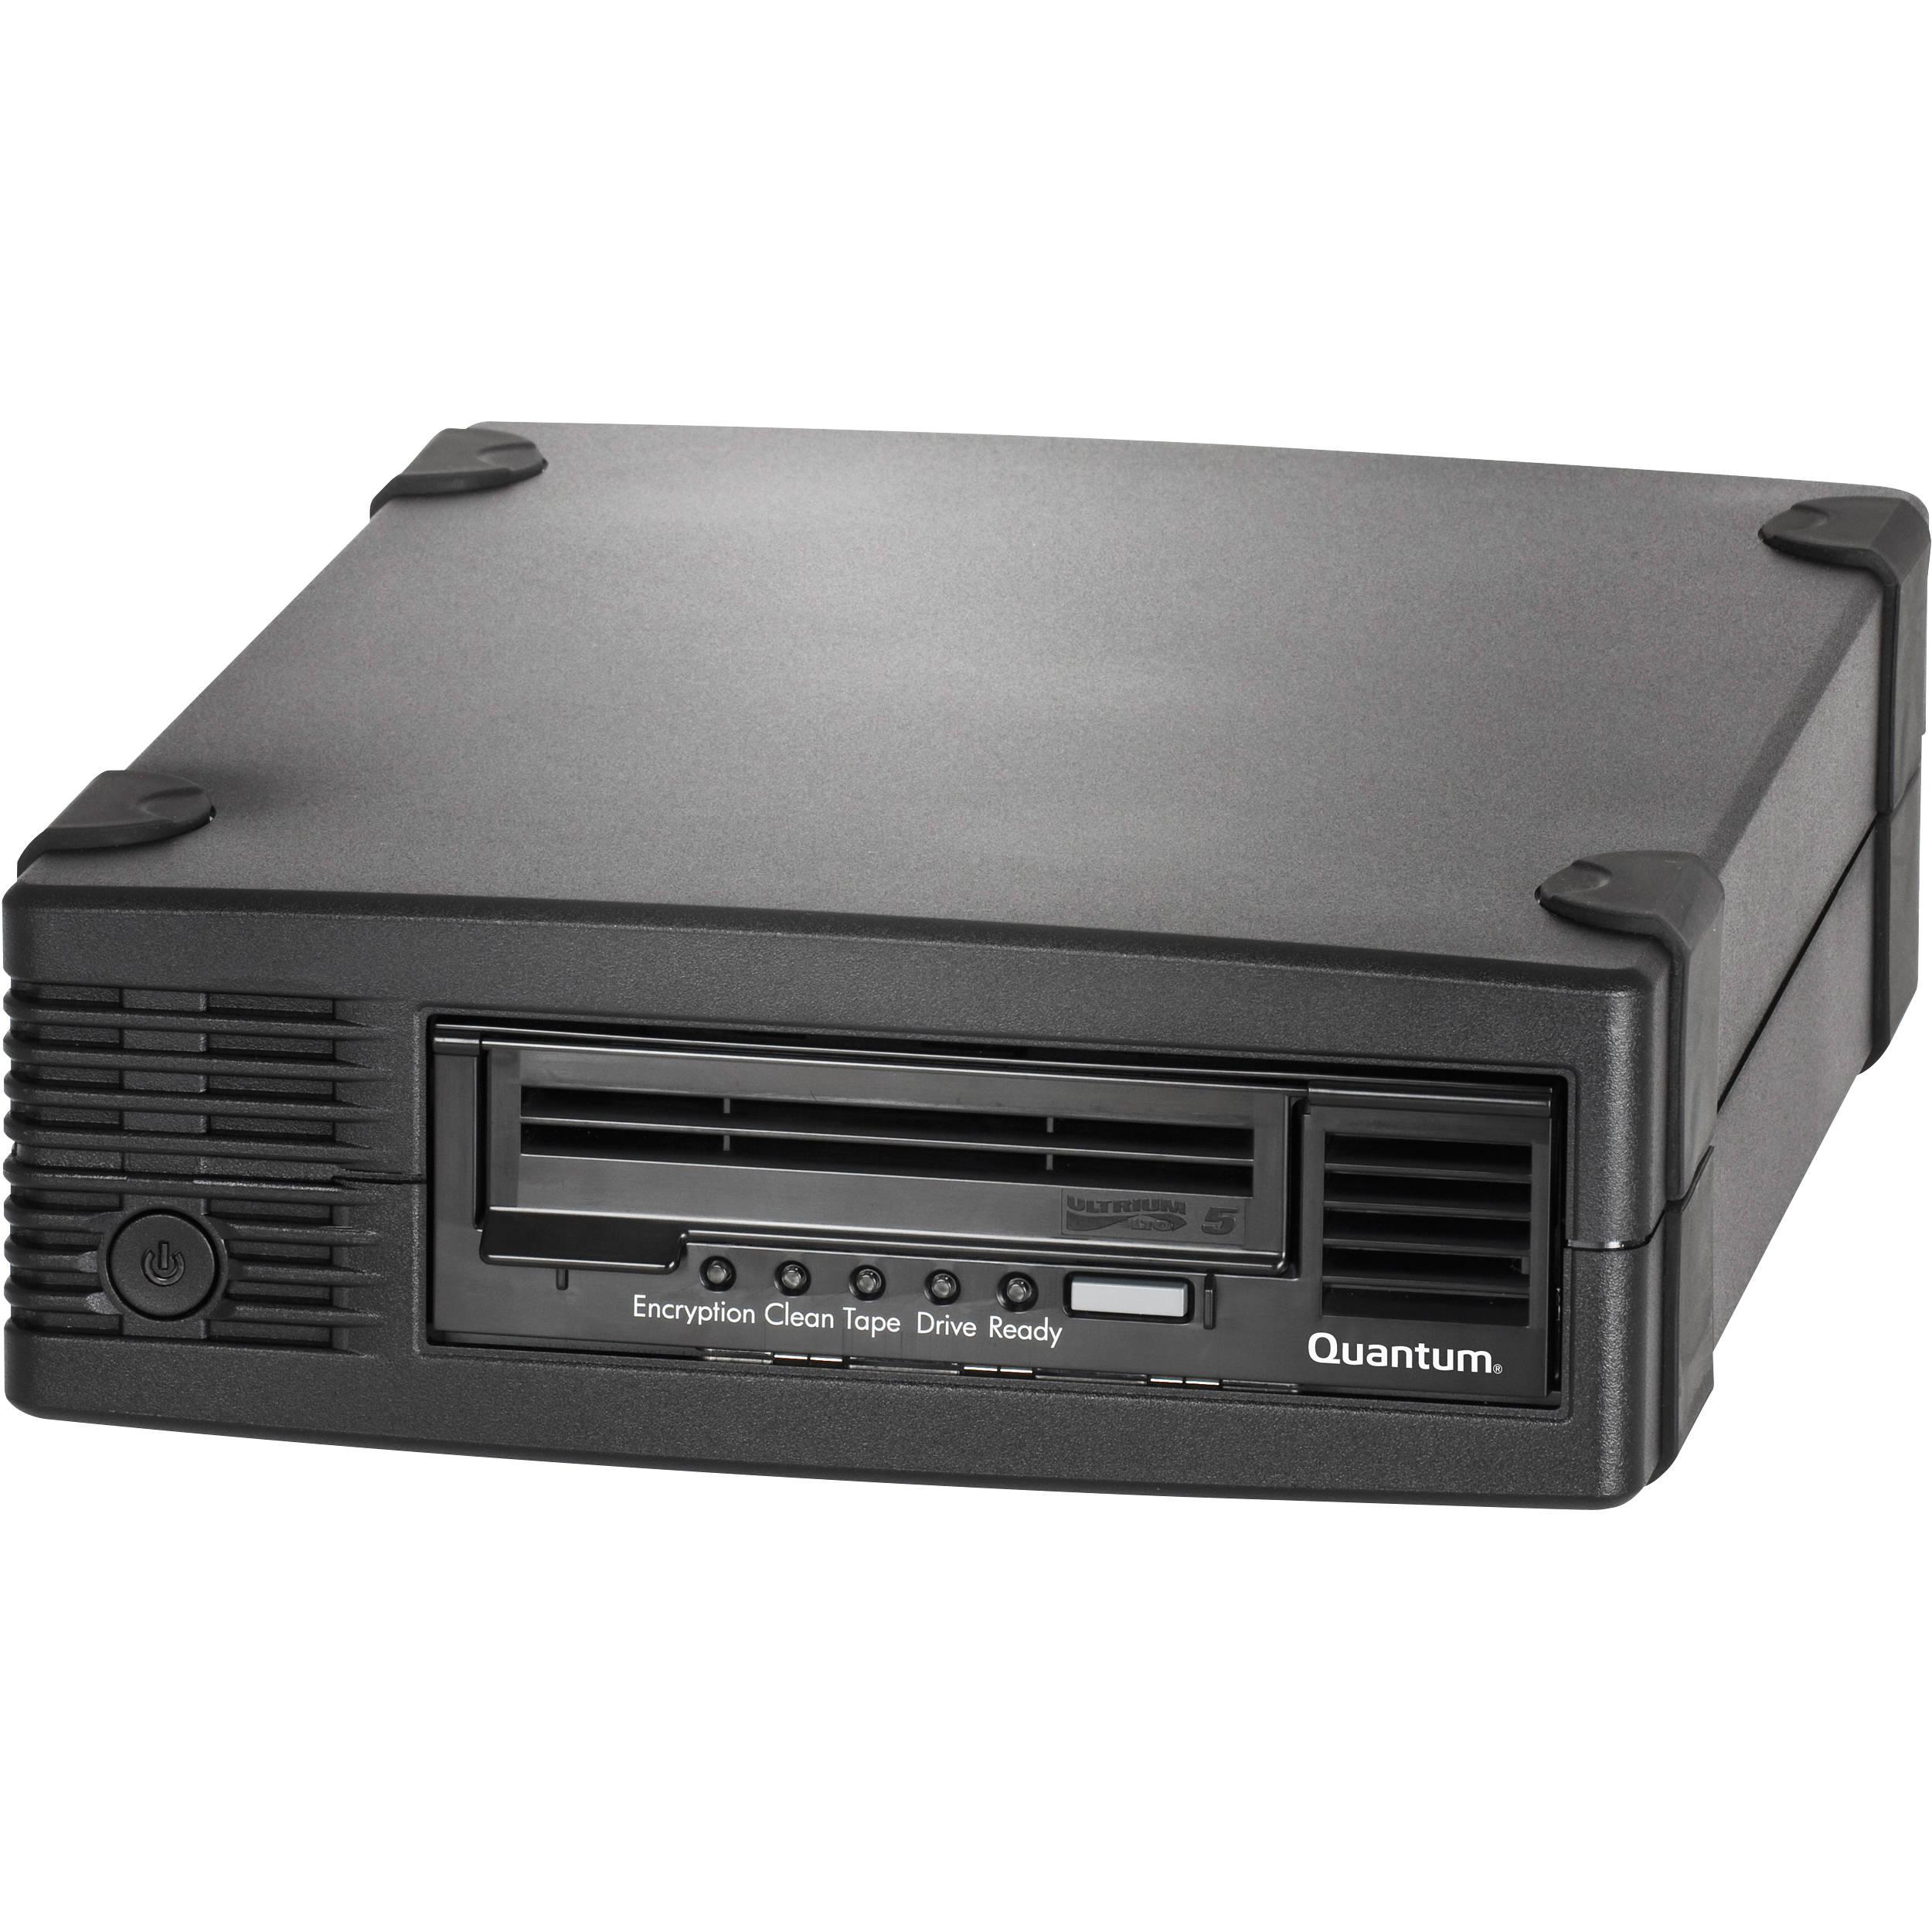 DELL CONEXANT D110 HDA MDC V.92 MODEM WINDOWS DRIVER